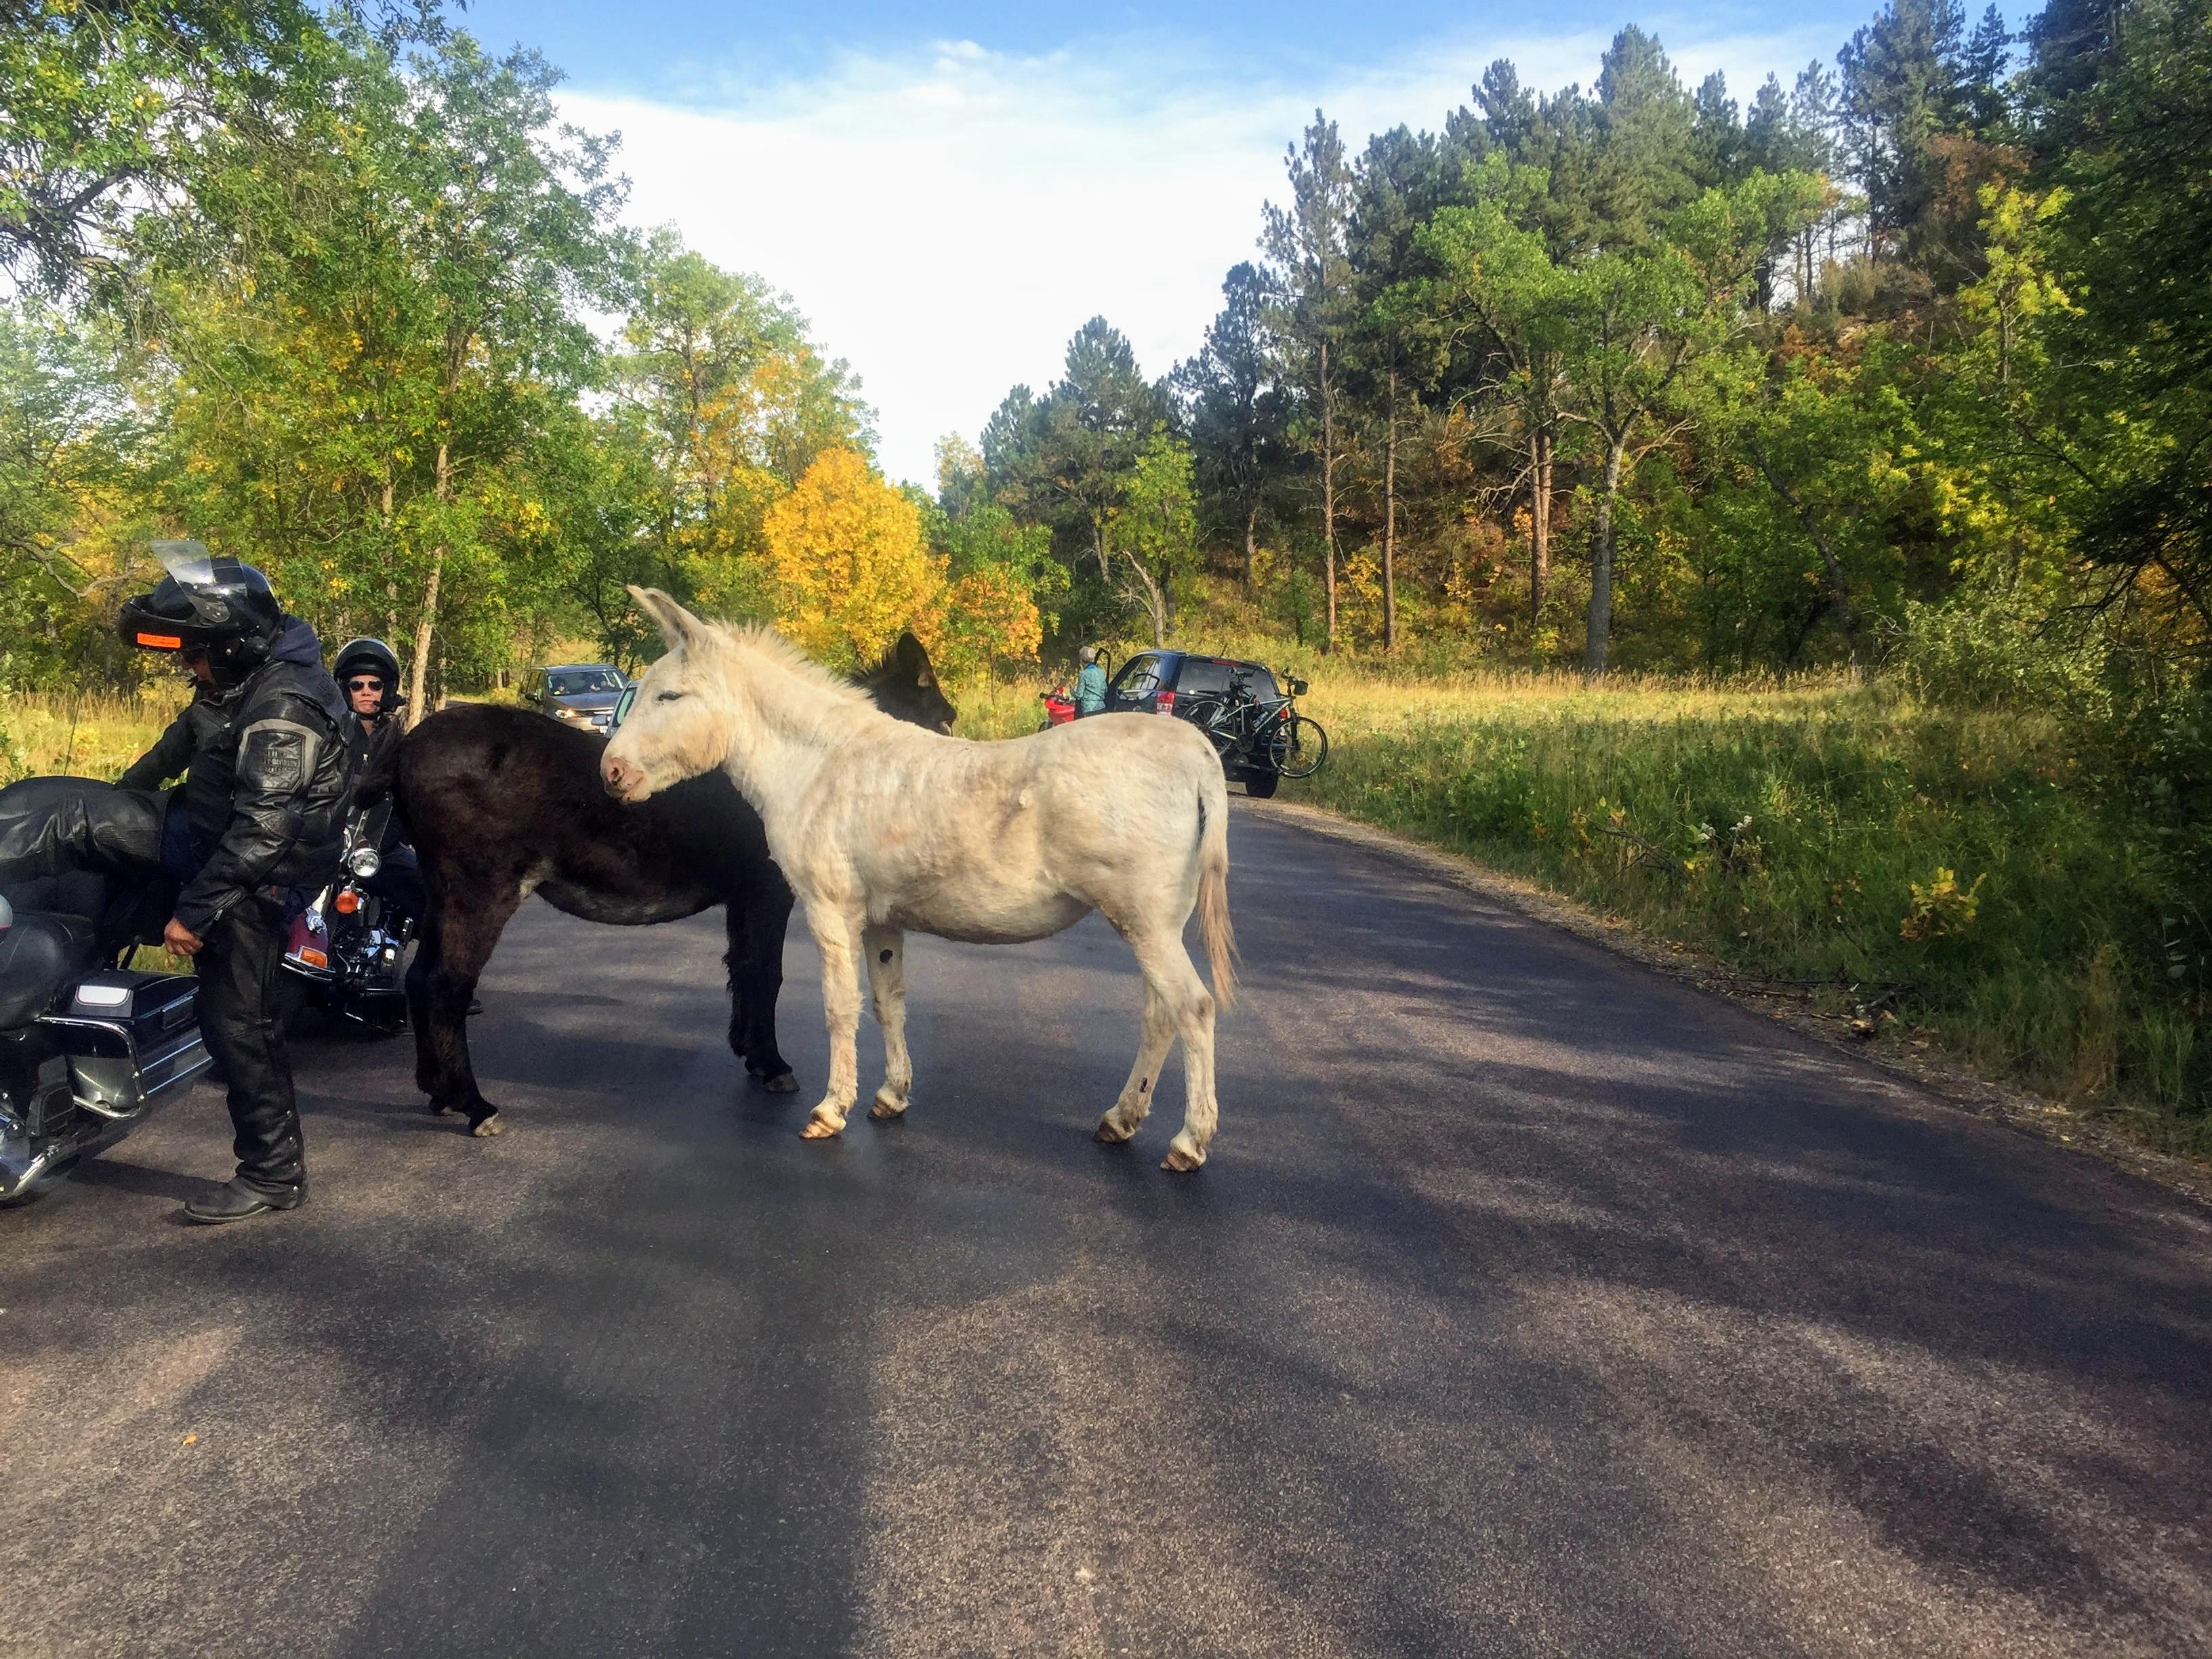 2017-09-17 Black Hills 32 Custer Wildlife 01 Donkey